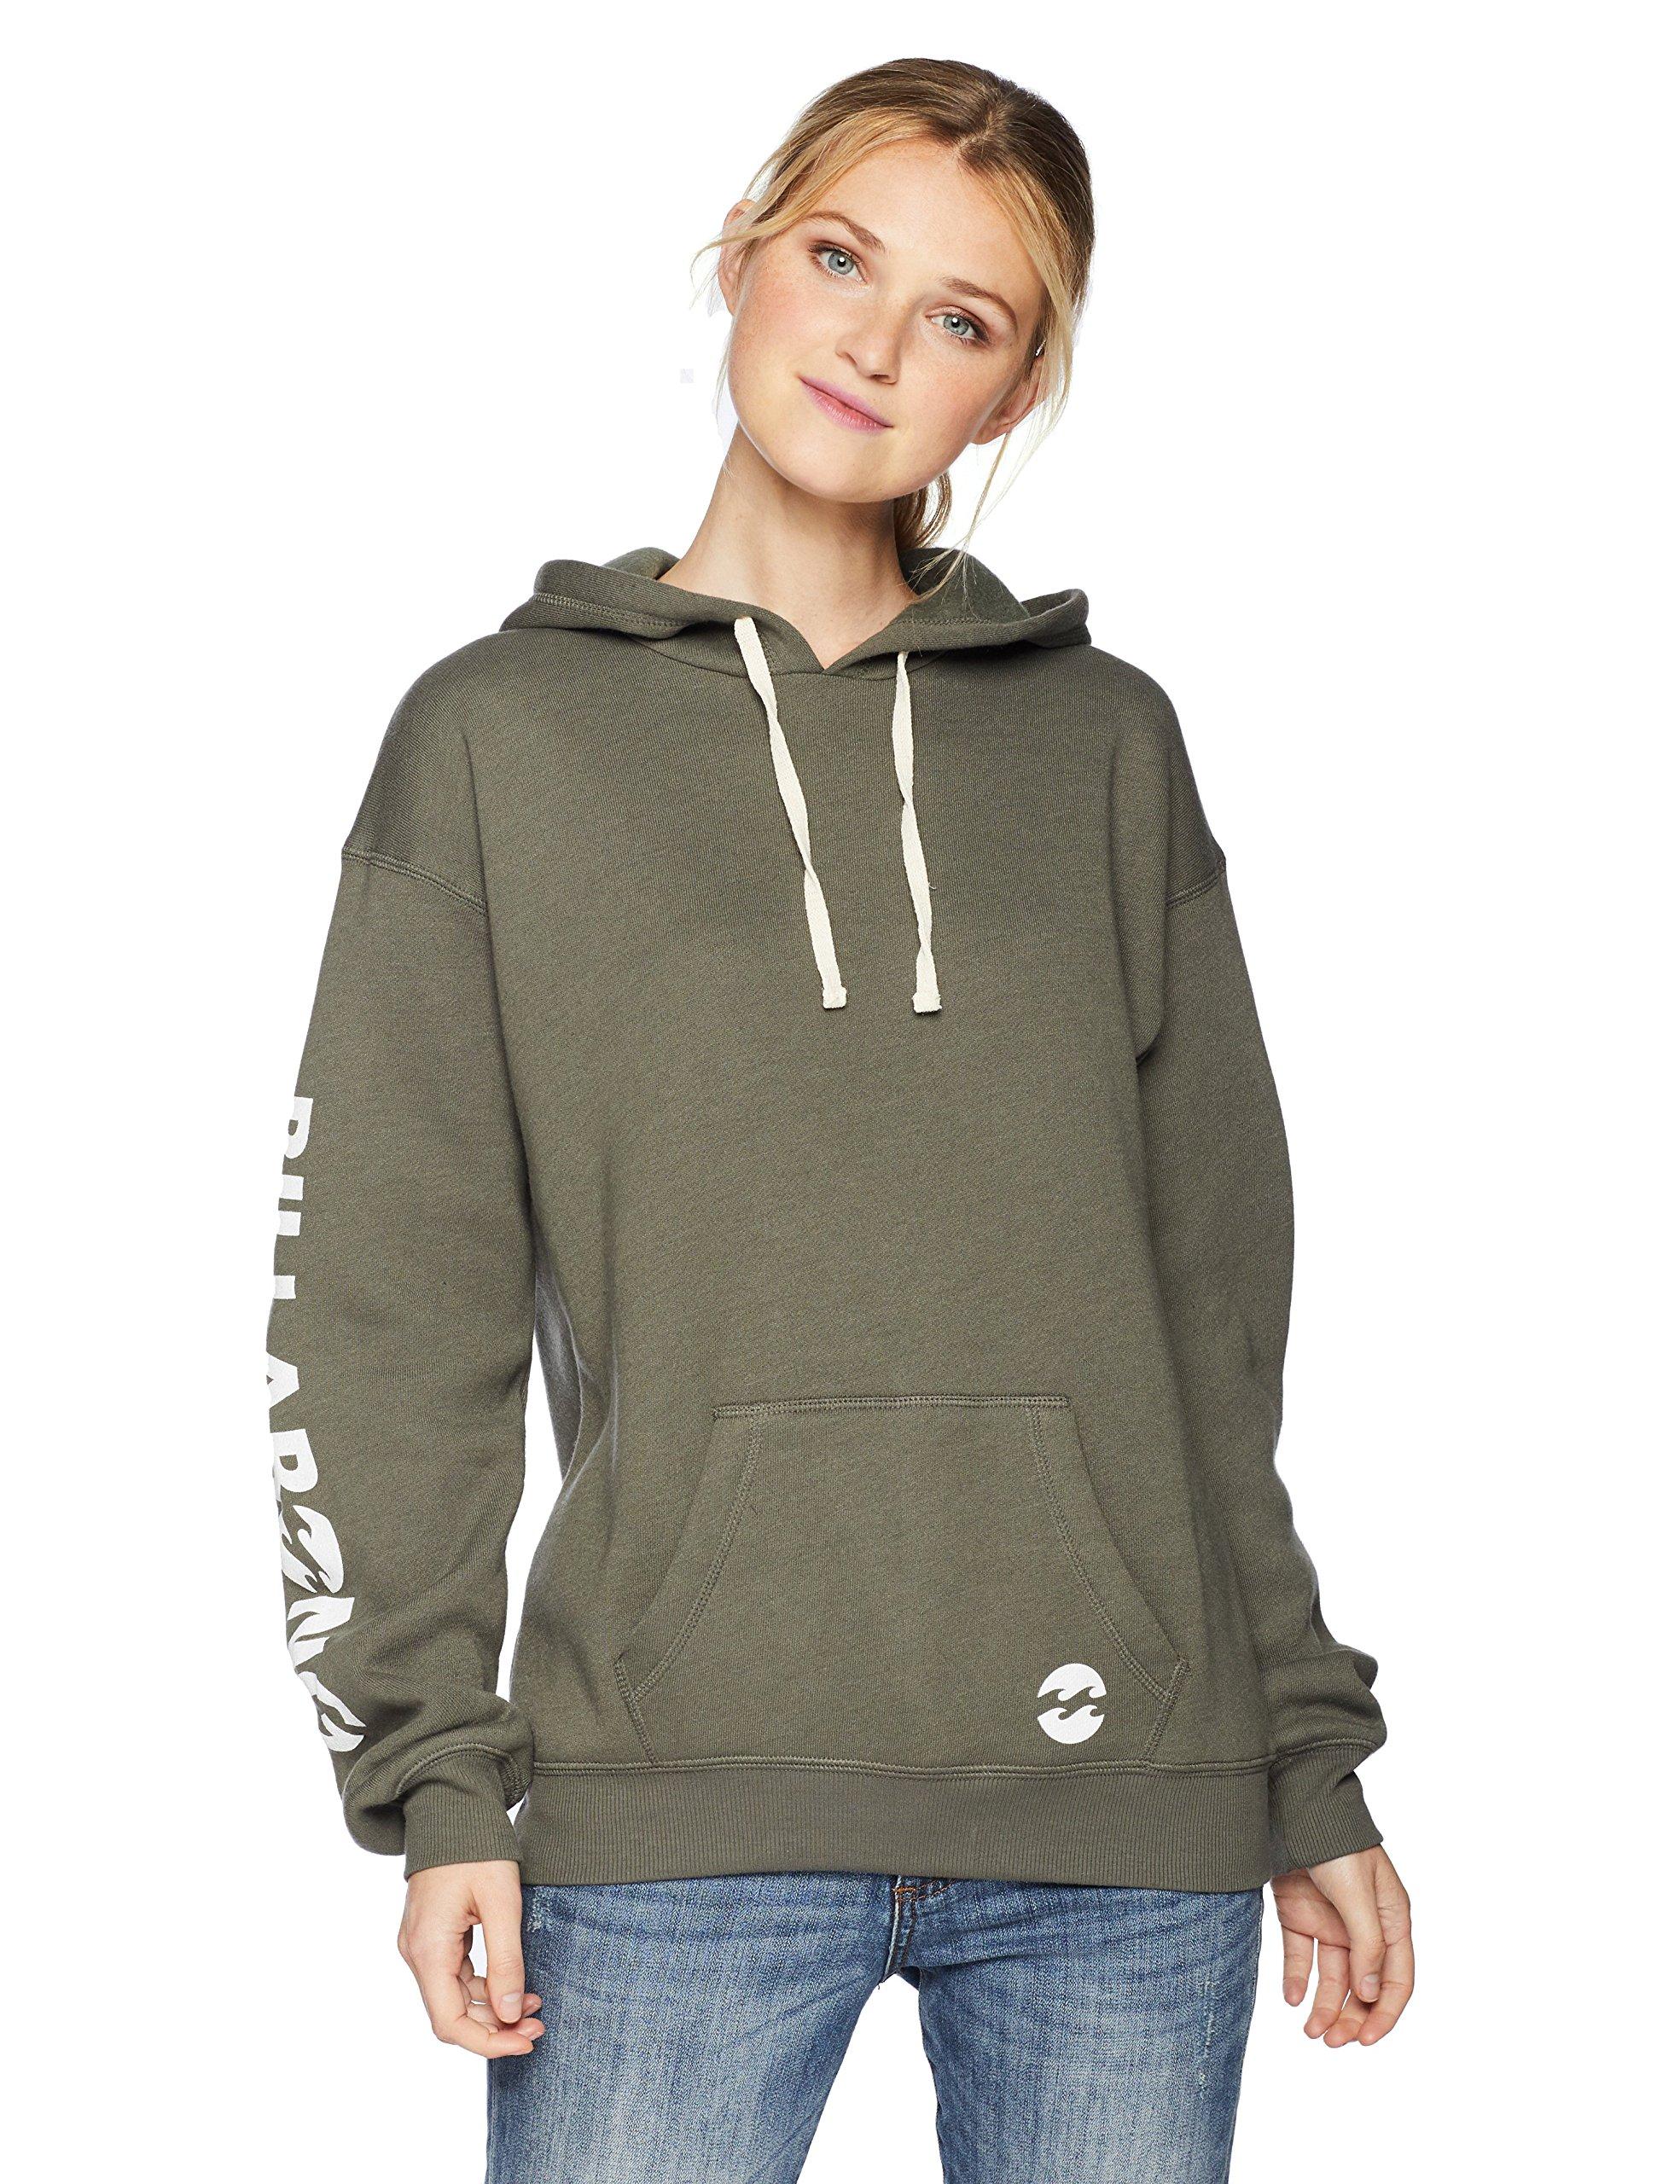 Billabong Women's Legacy Hooded Sweatshirt, Olive, M